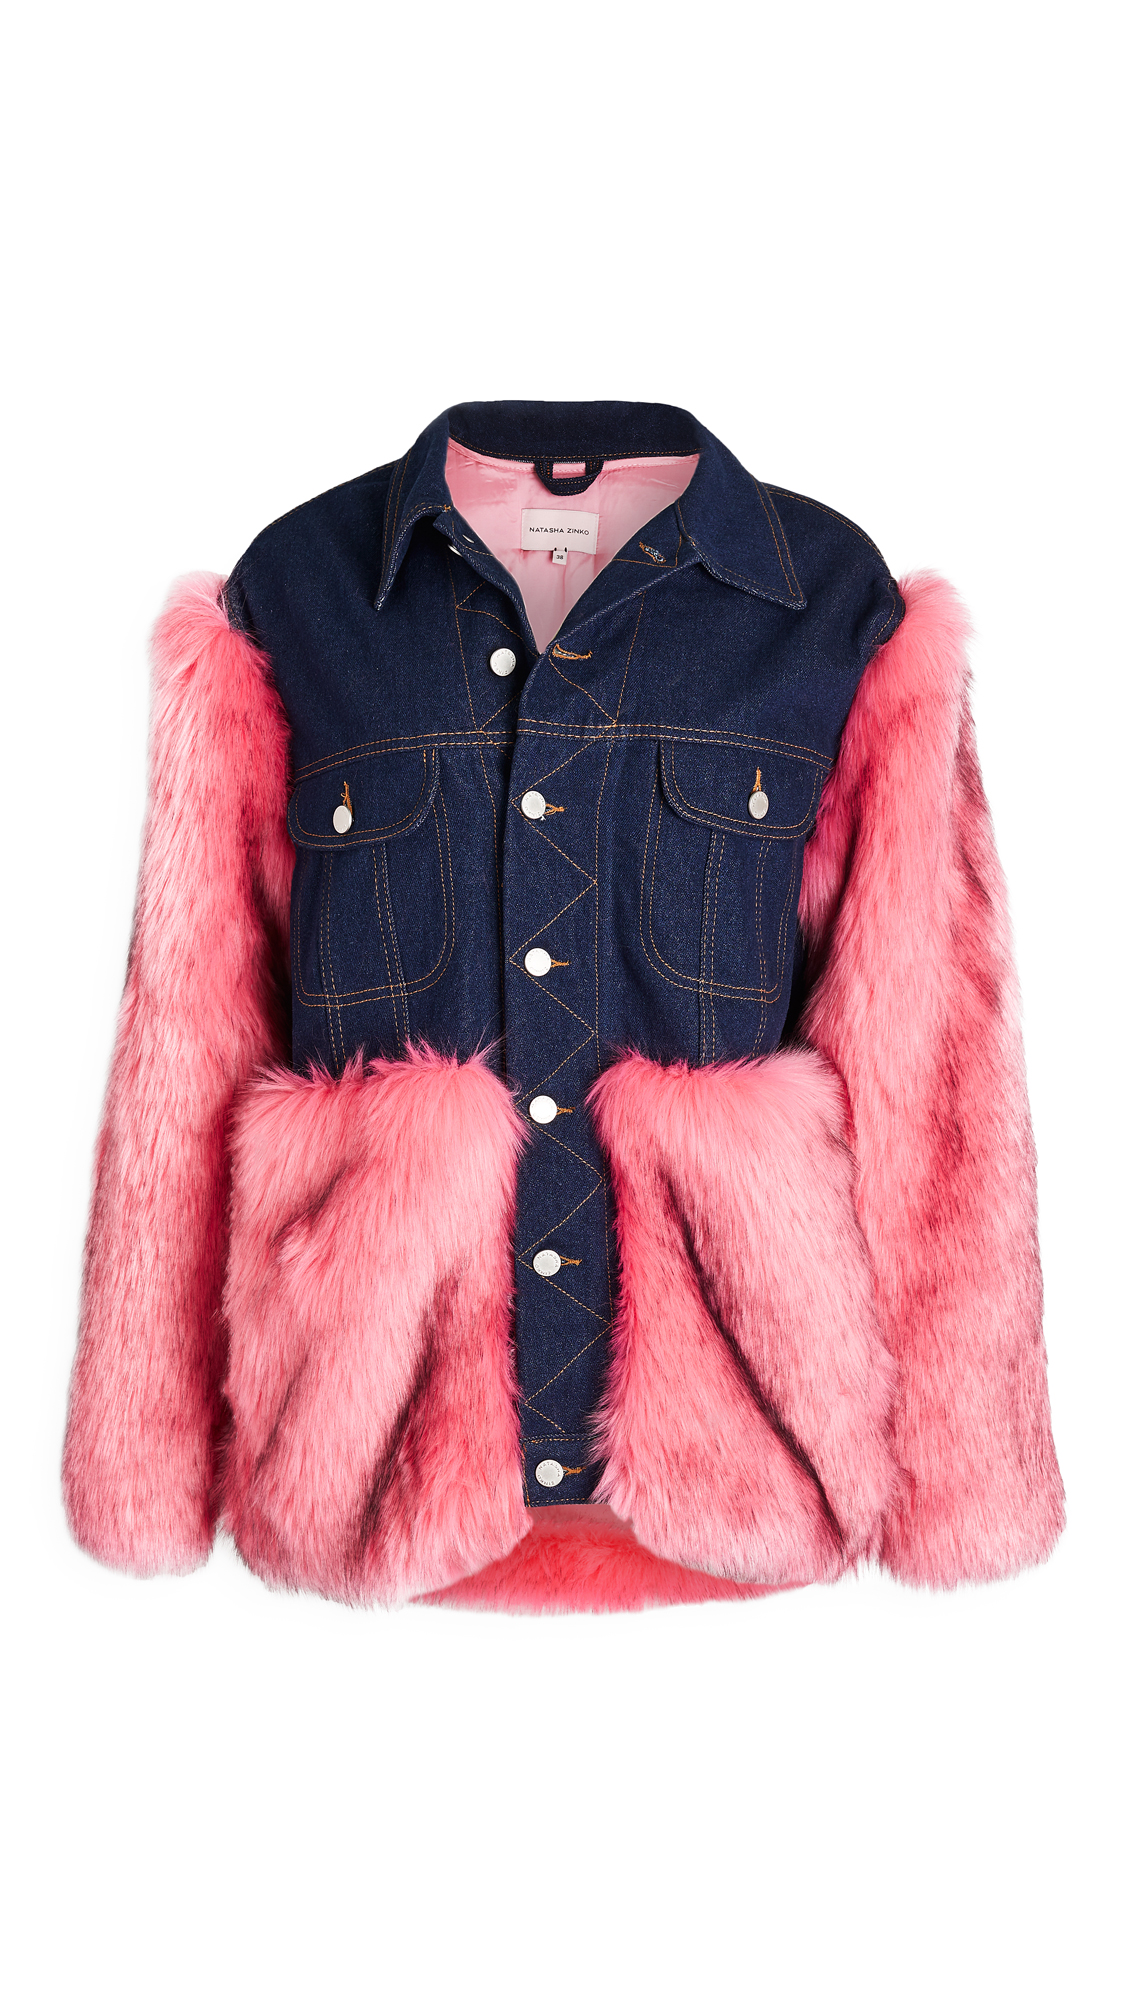 Natasha Zinko Faux Fur & Denim Jacket